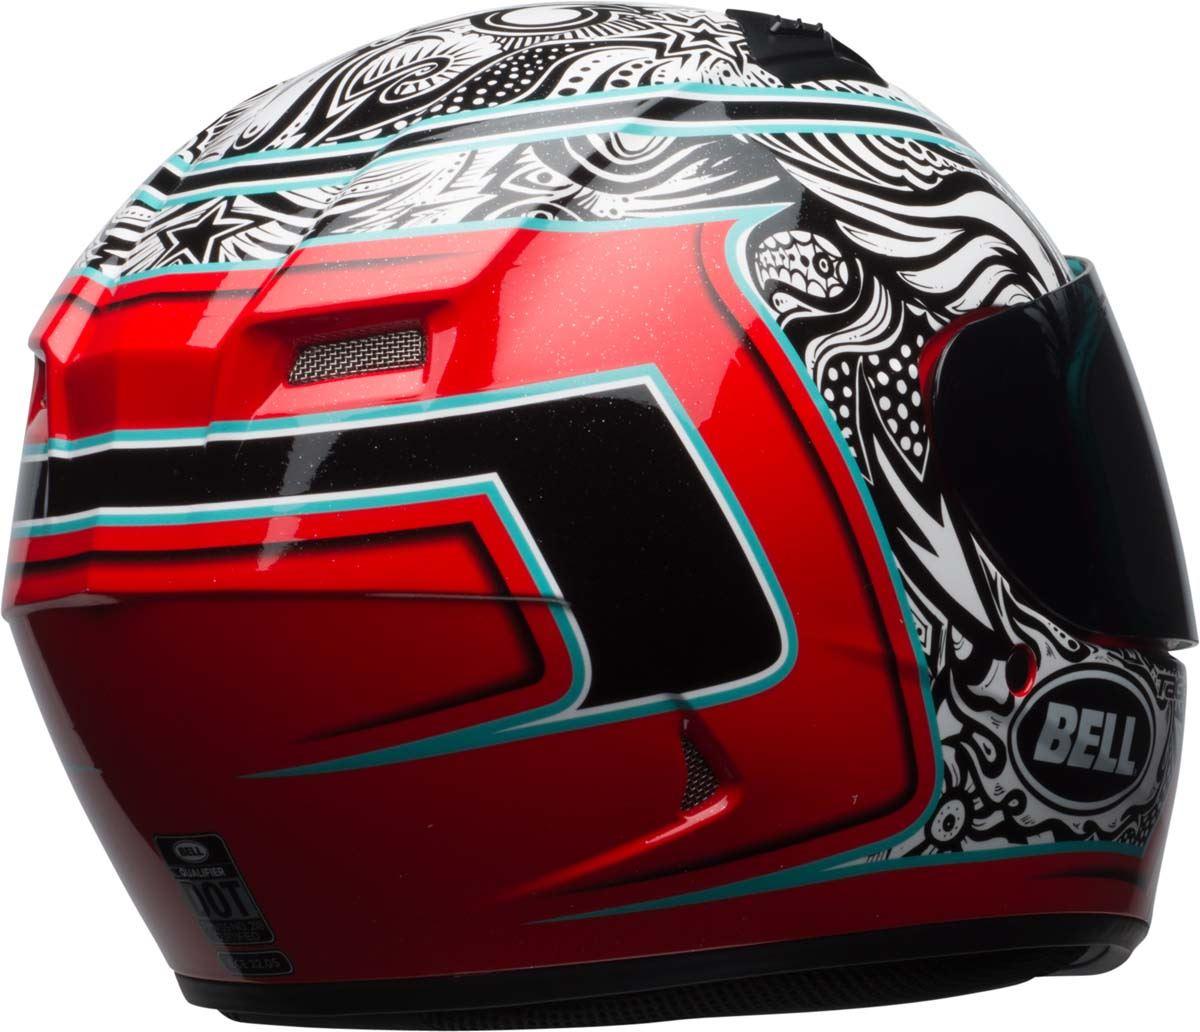 Bell-Qualifier-Helmet-Full-Face-Motorcycle-Clear-Shield-DOT-XS-3XL miniature 50